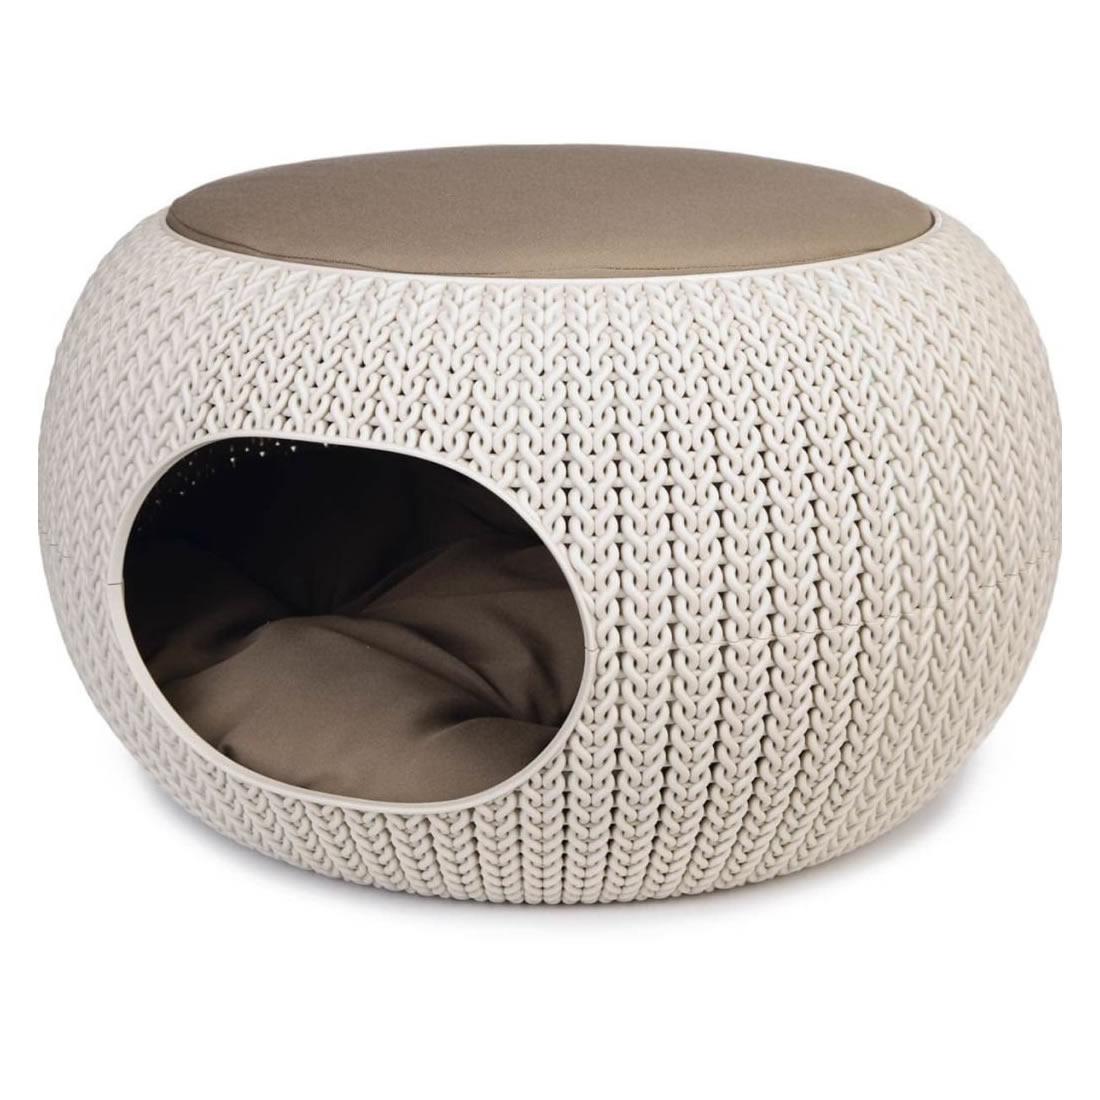 Cucce Design Per Cani curver cozy pet home - cuccia da interno per cani di piccola